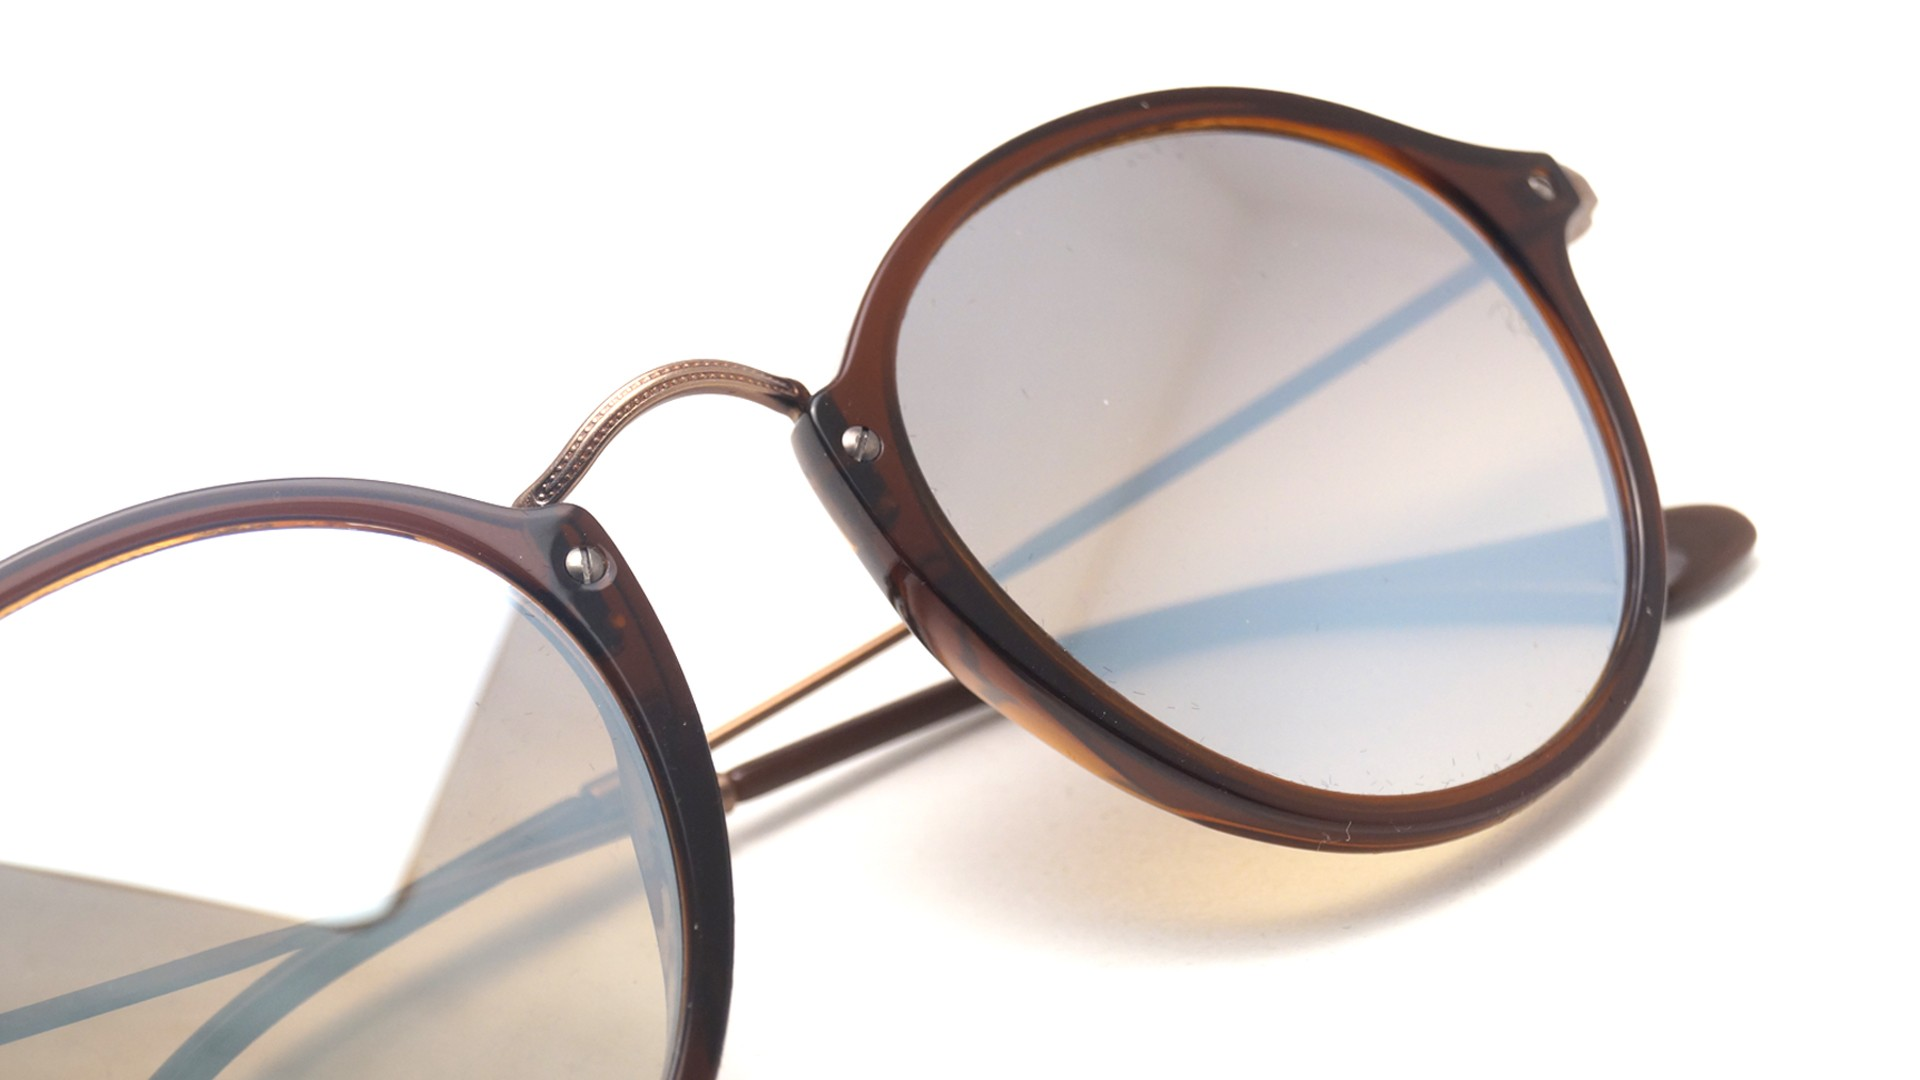 Super cool RayBan sunglasses